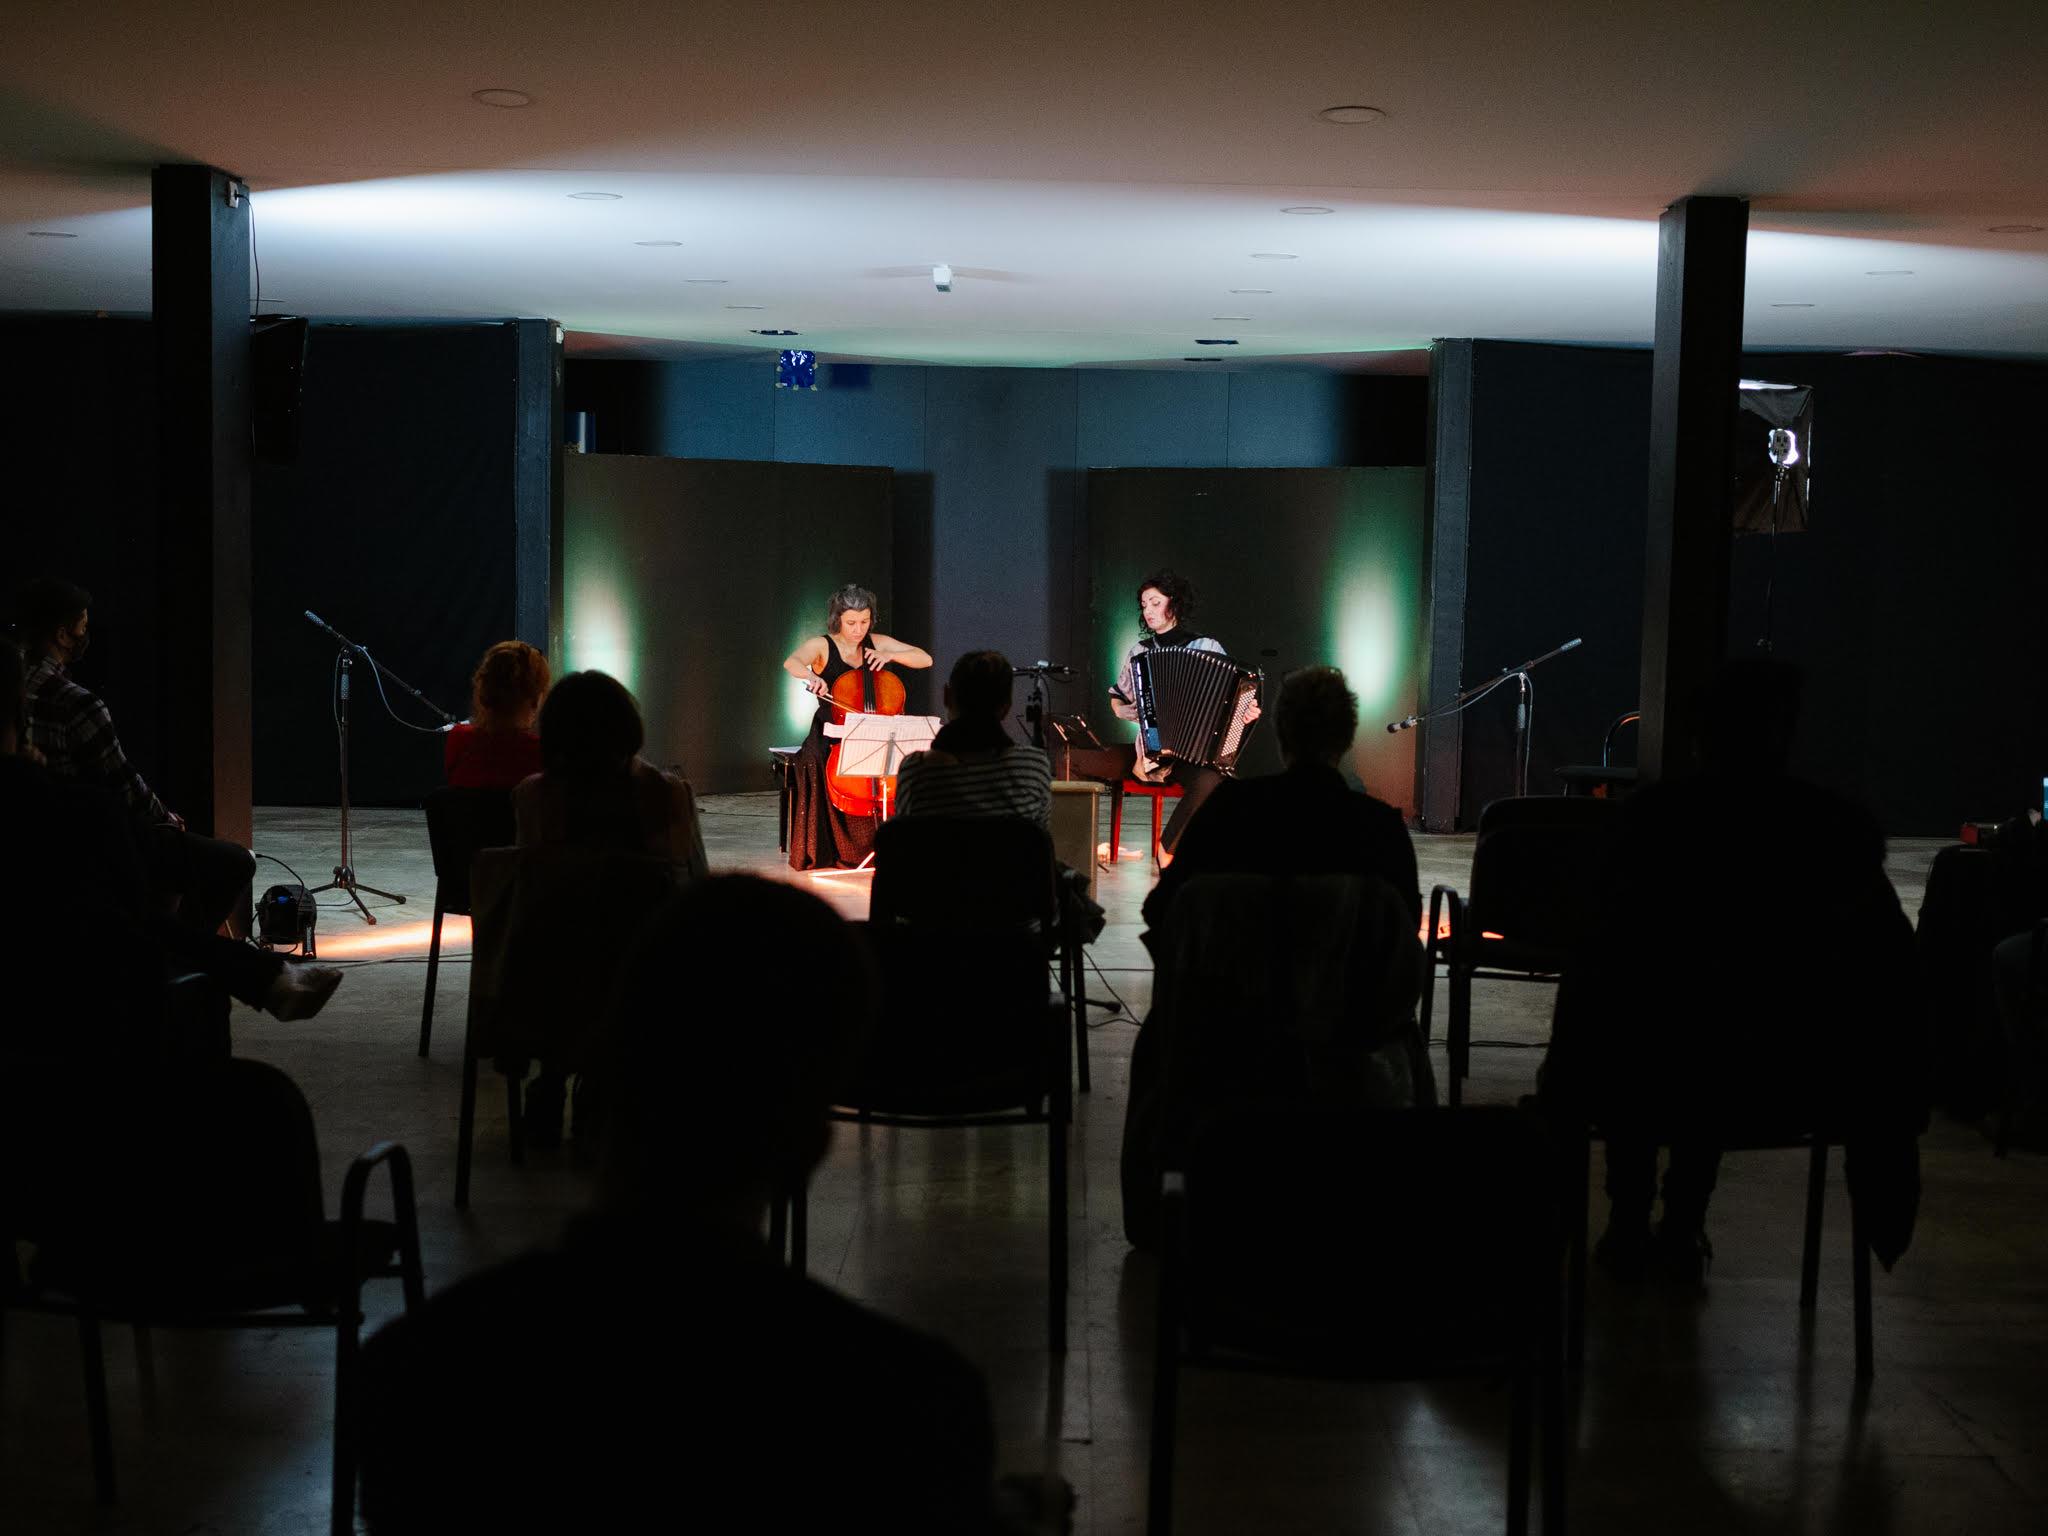 Snimak koncerta dua 2B (Belma Alić i Belma Šarančić)